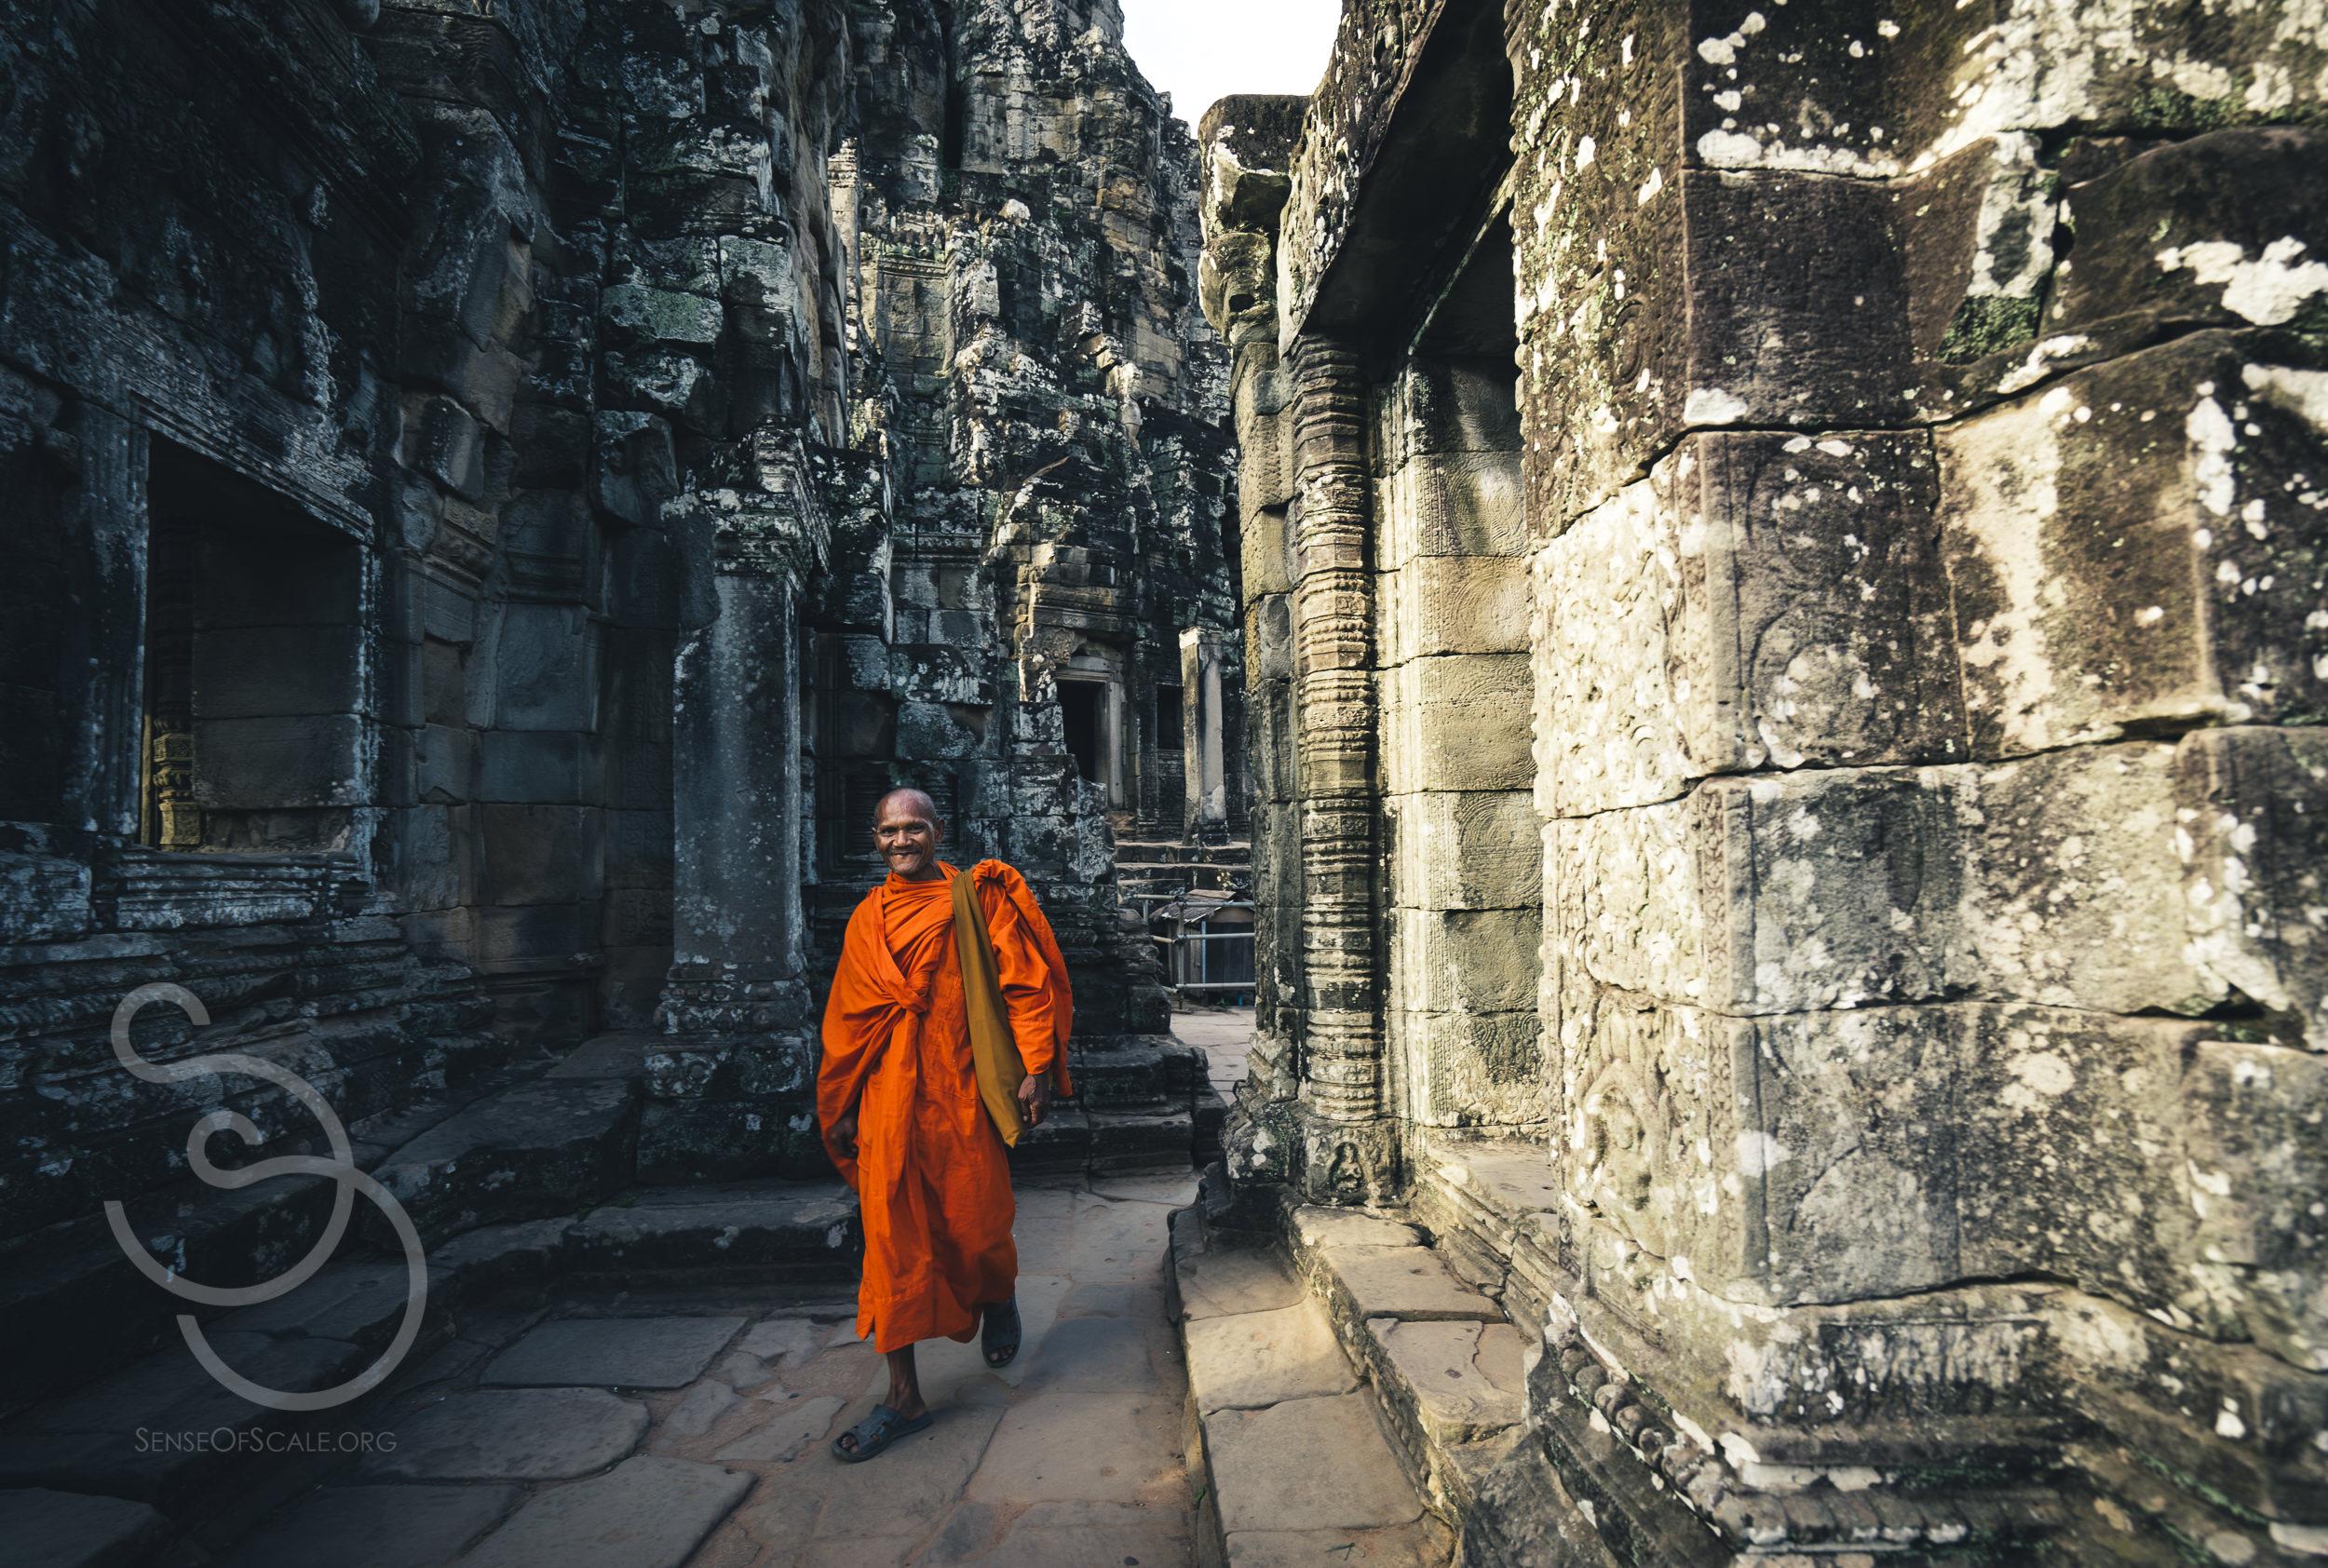 Monk walking and smiling